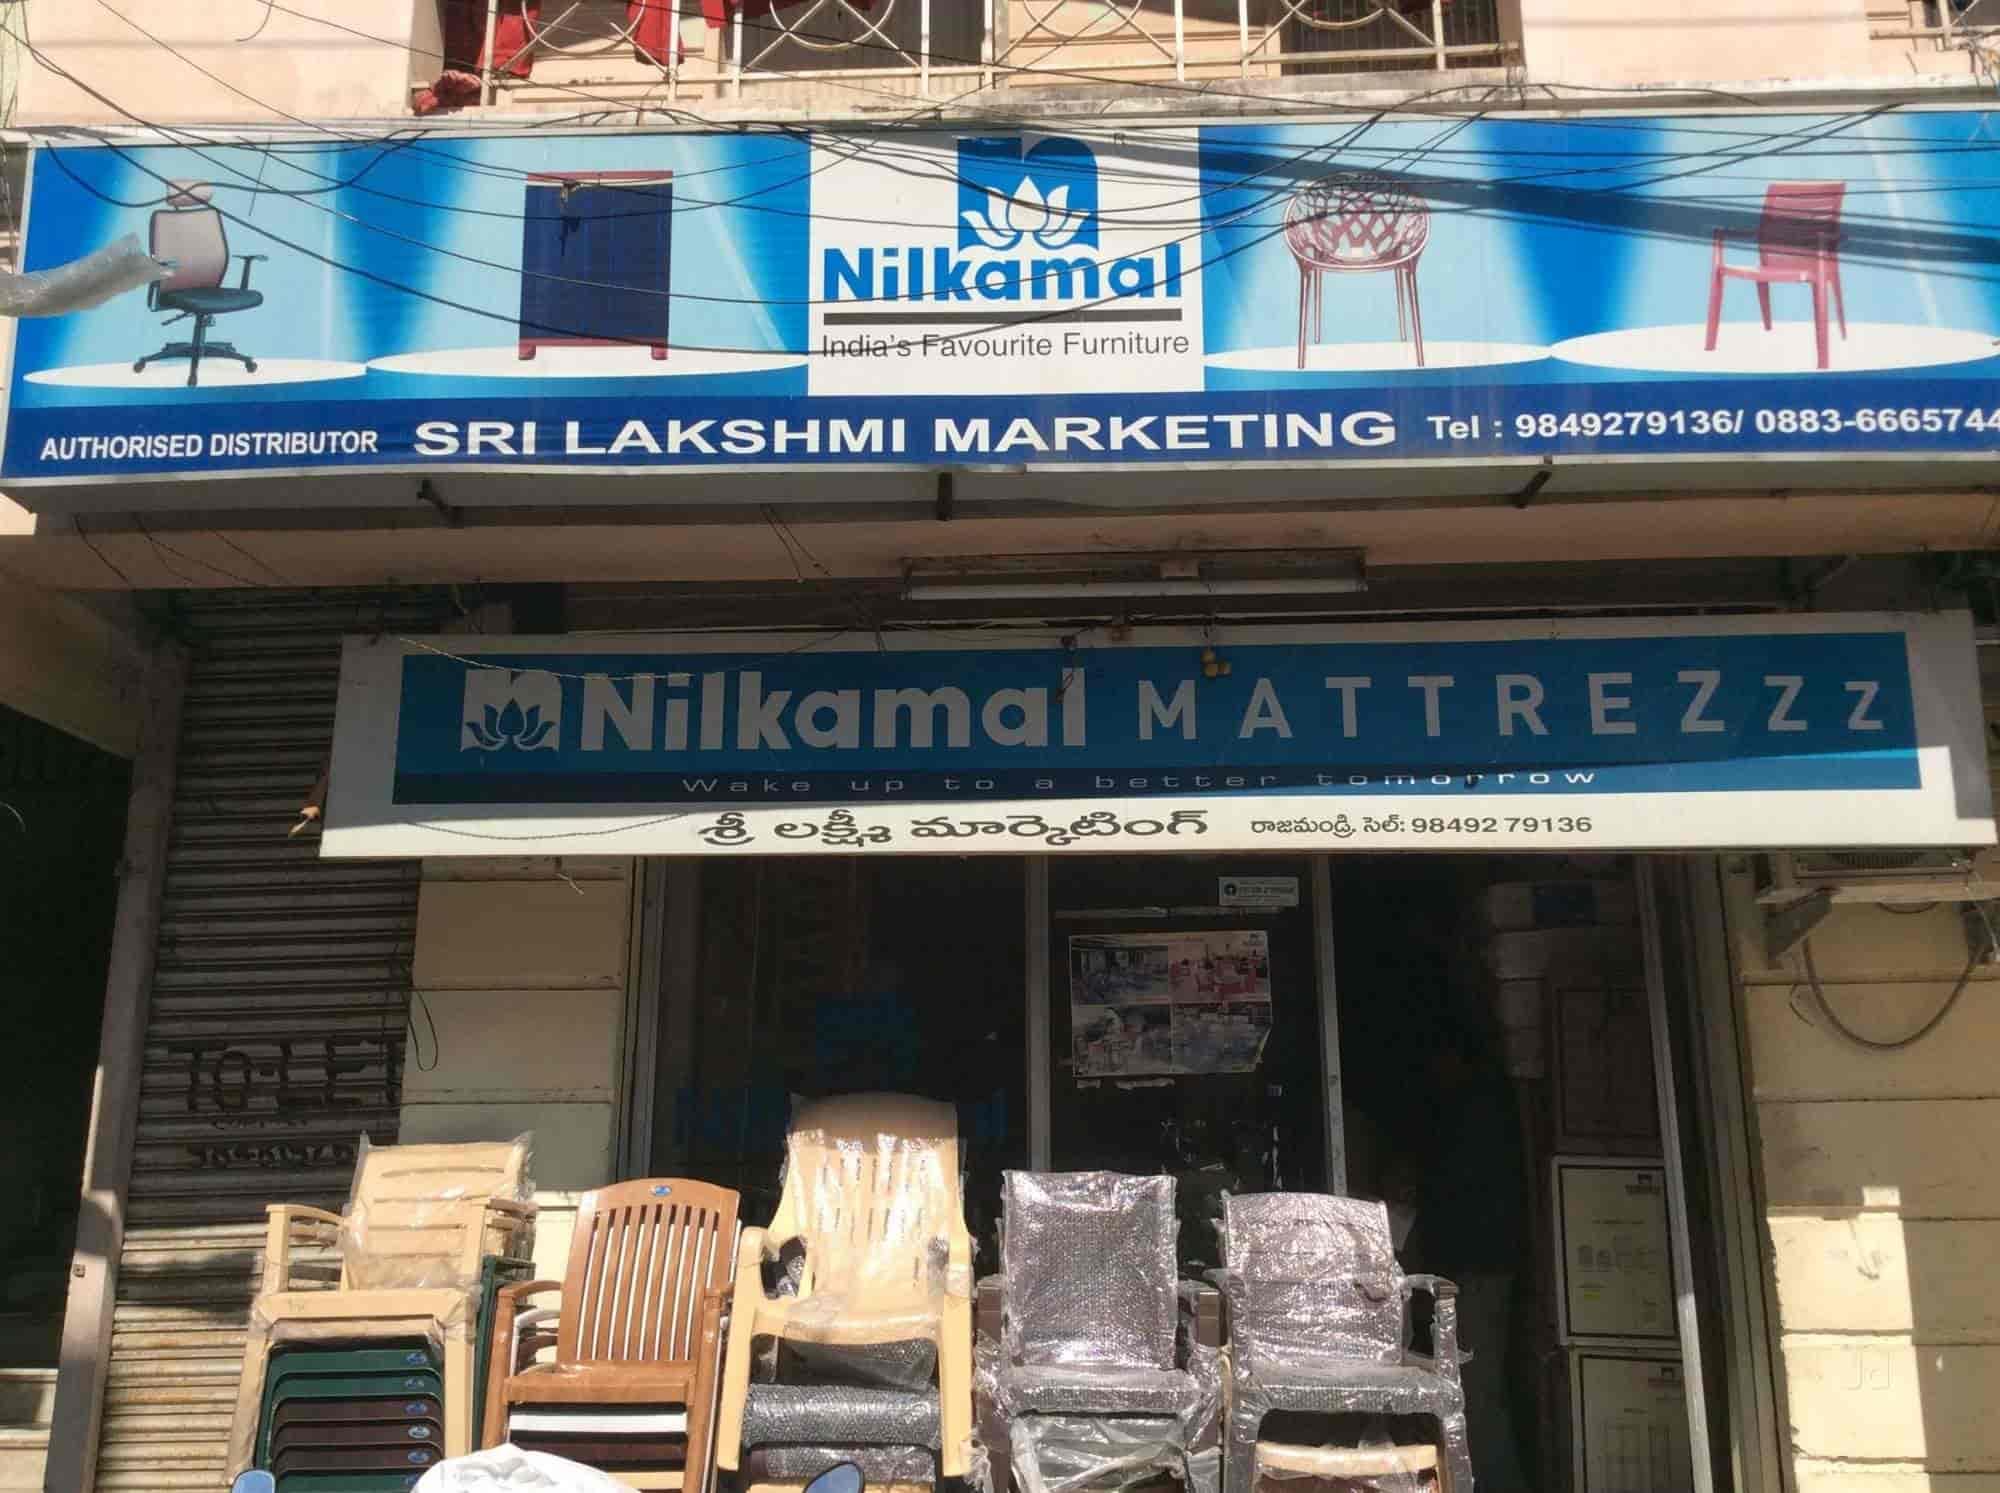 sri lakshmi marketing mangalavarapu peta furniture dealers in rh justdial com